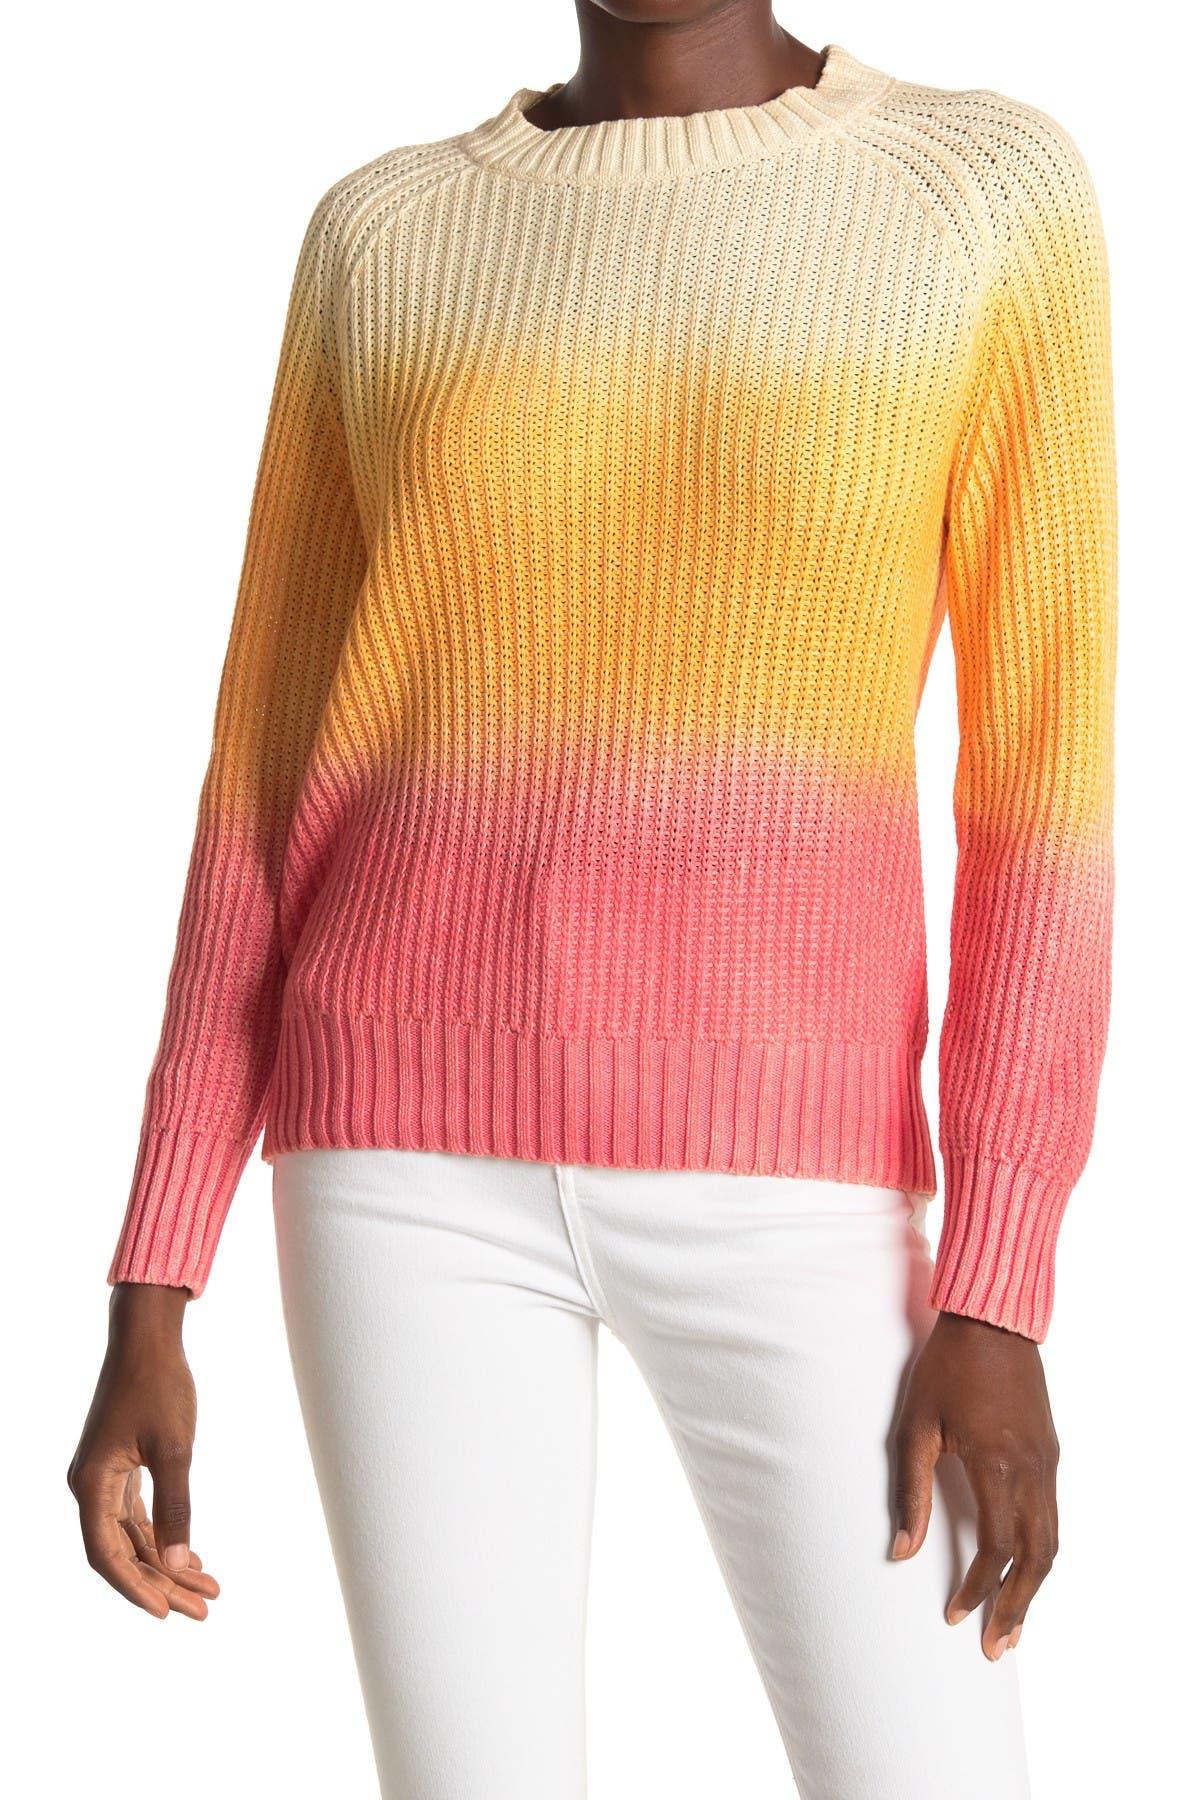 Image of Lush Ombre Fade Raglan Sweater